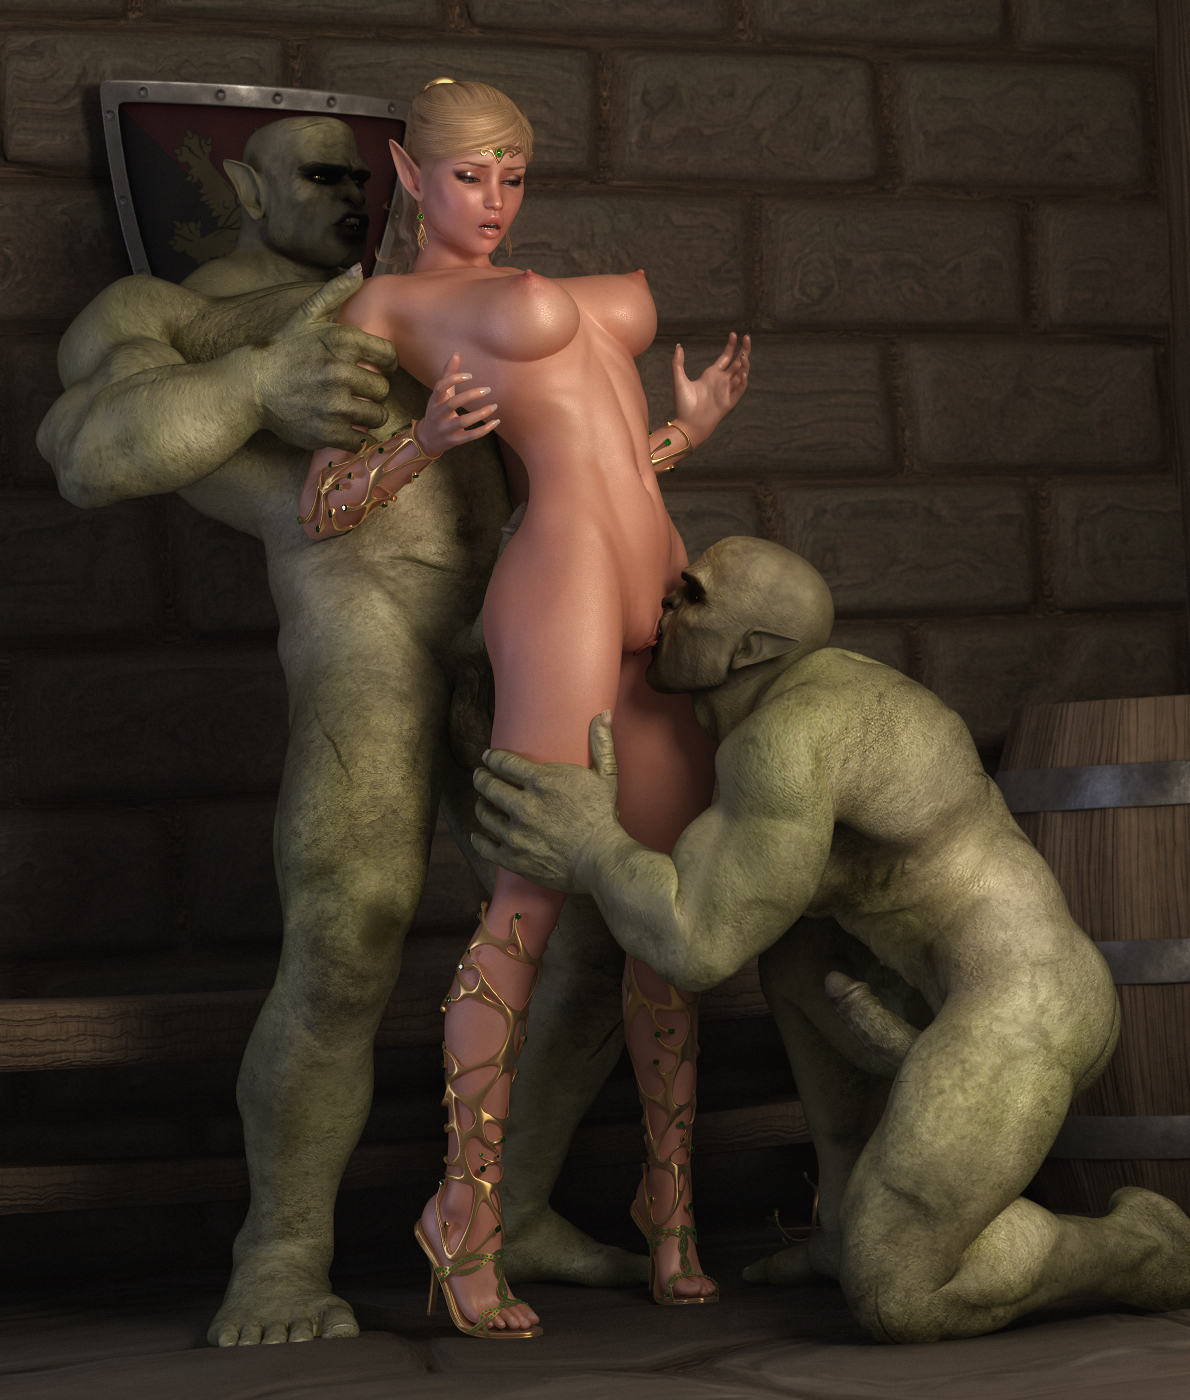 Xxx zomble fuck beautiful girl cartoon naked petite virgin